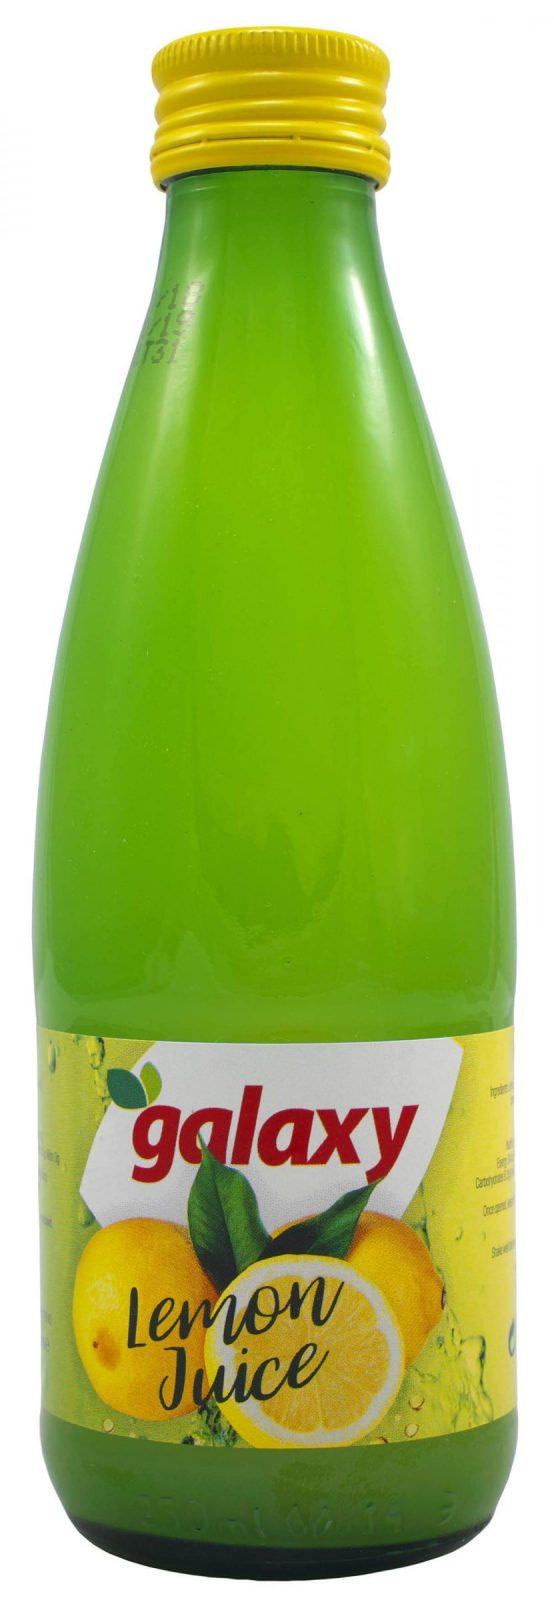 GALAXY lemon juice 250ml scaled